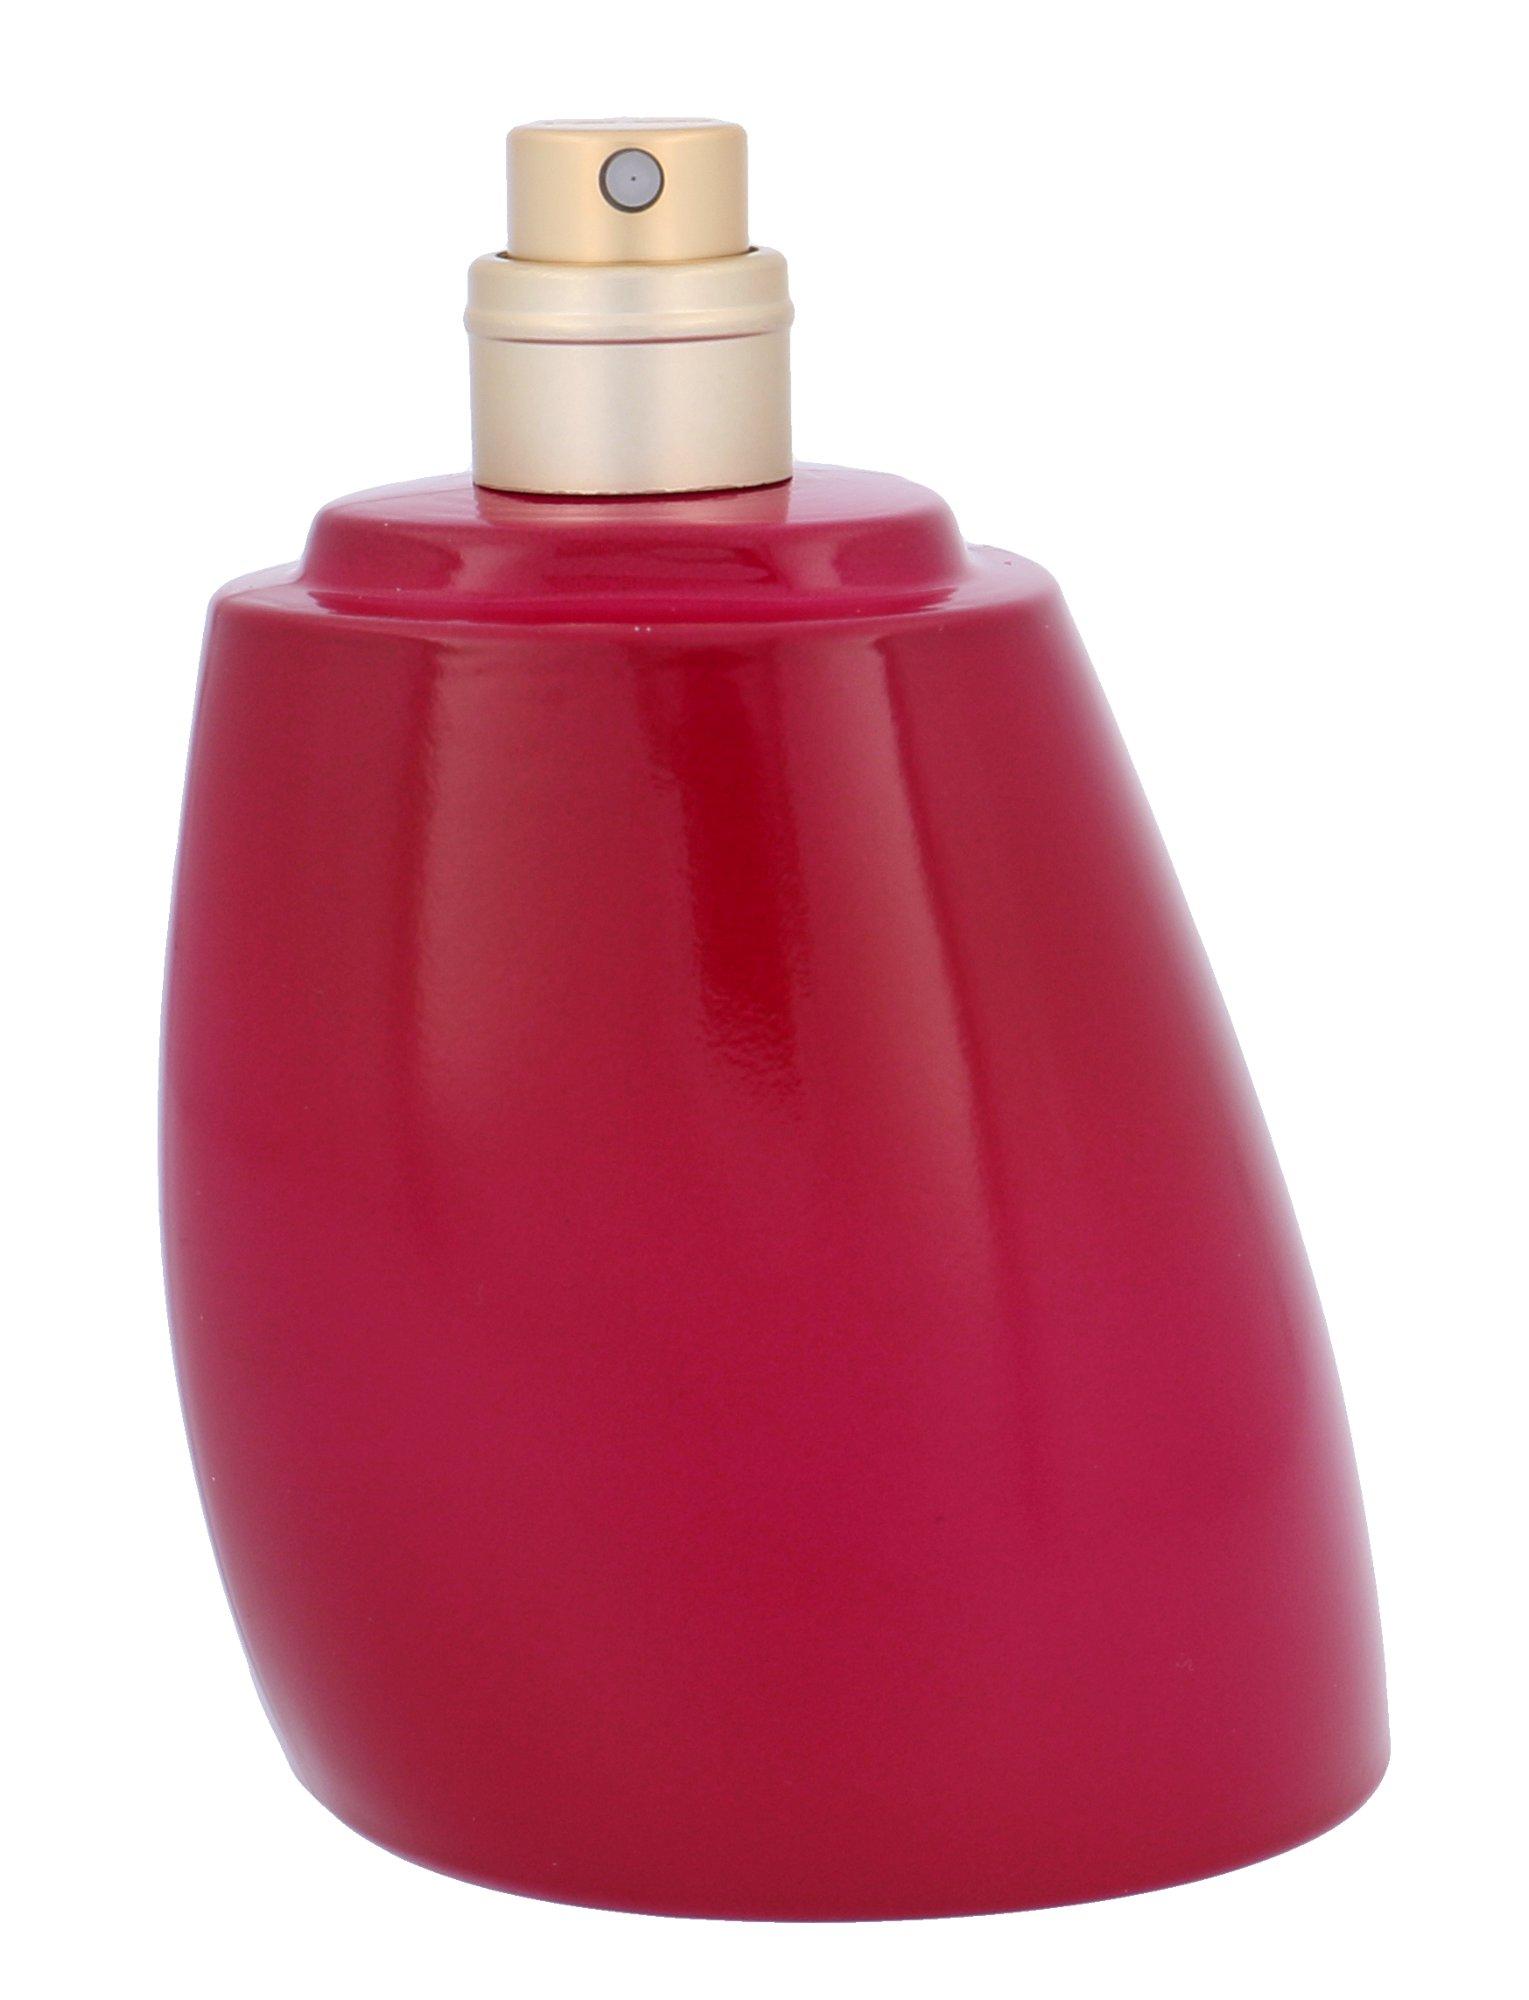 KENZO Kenzo Amour, Parfumovaná voda 100ml, Tester